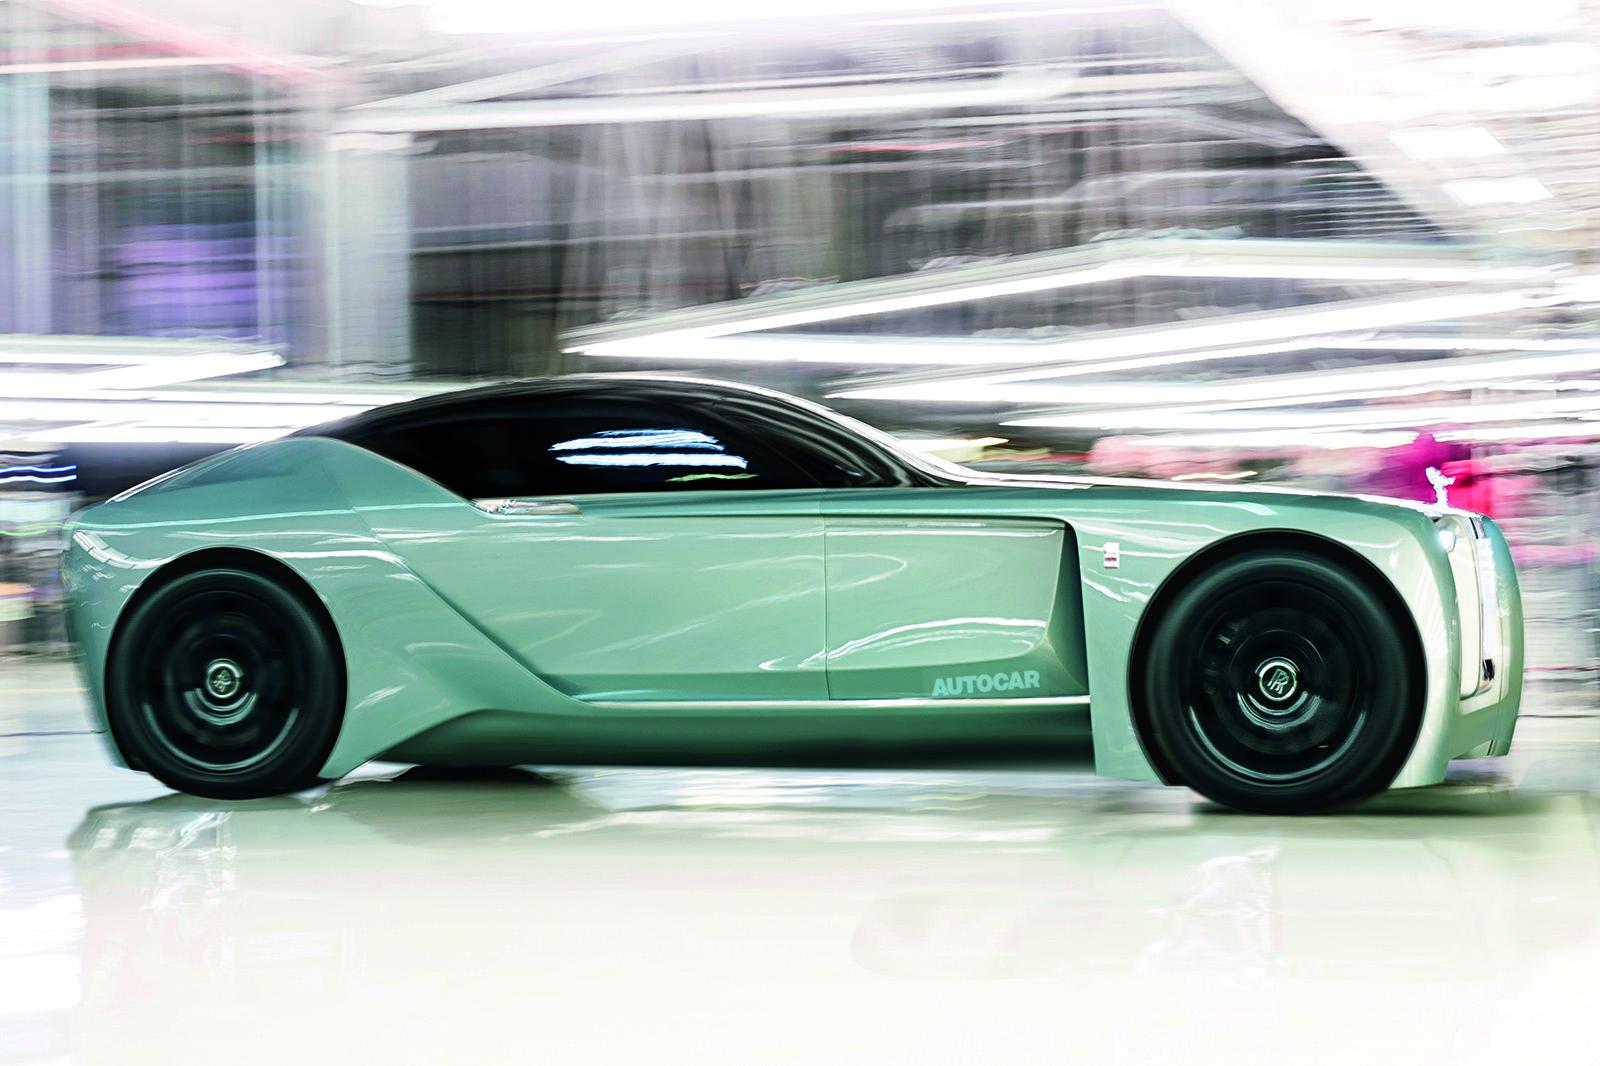 Bespoke 'Silent Shadow' to start EV era at Rolls-Royce   Autocar